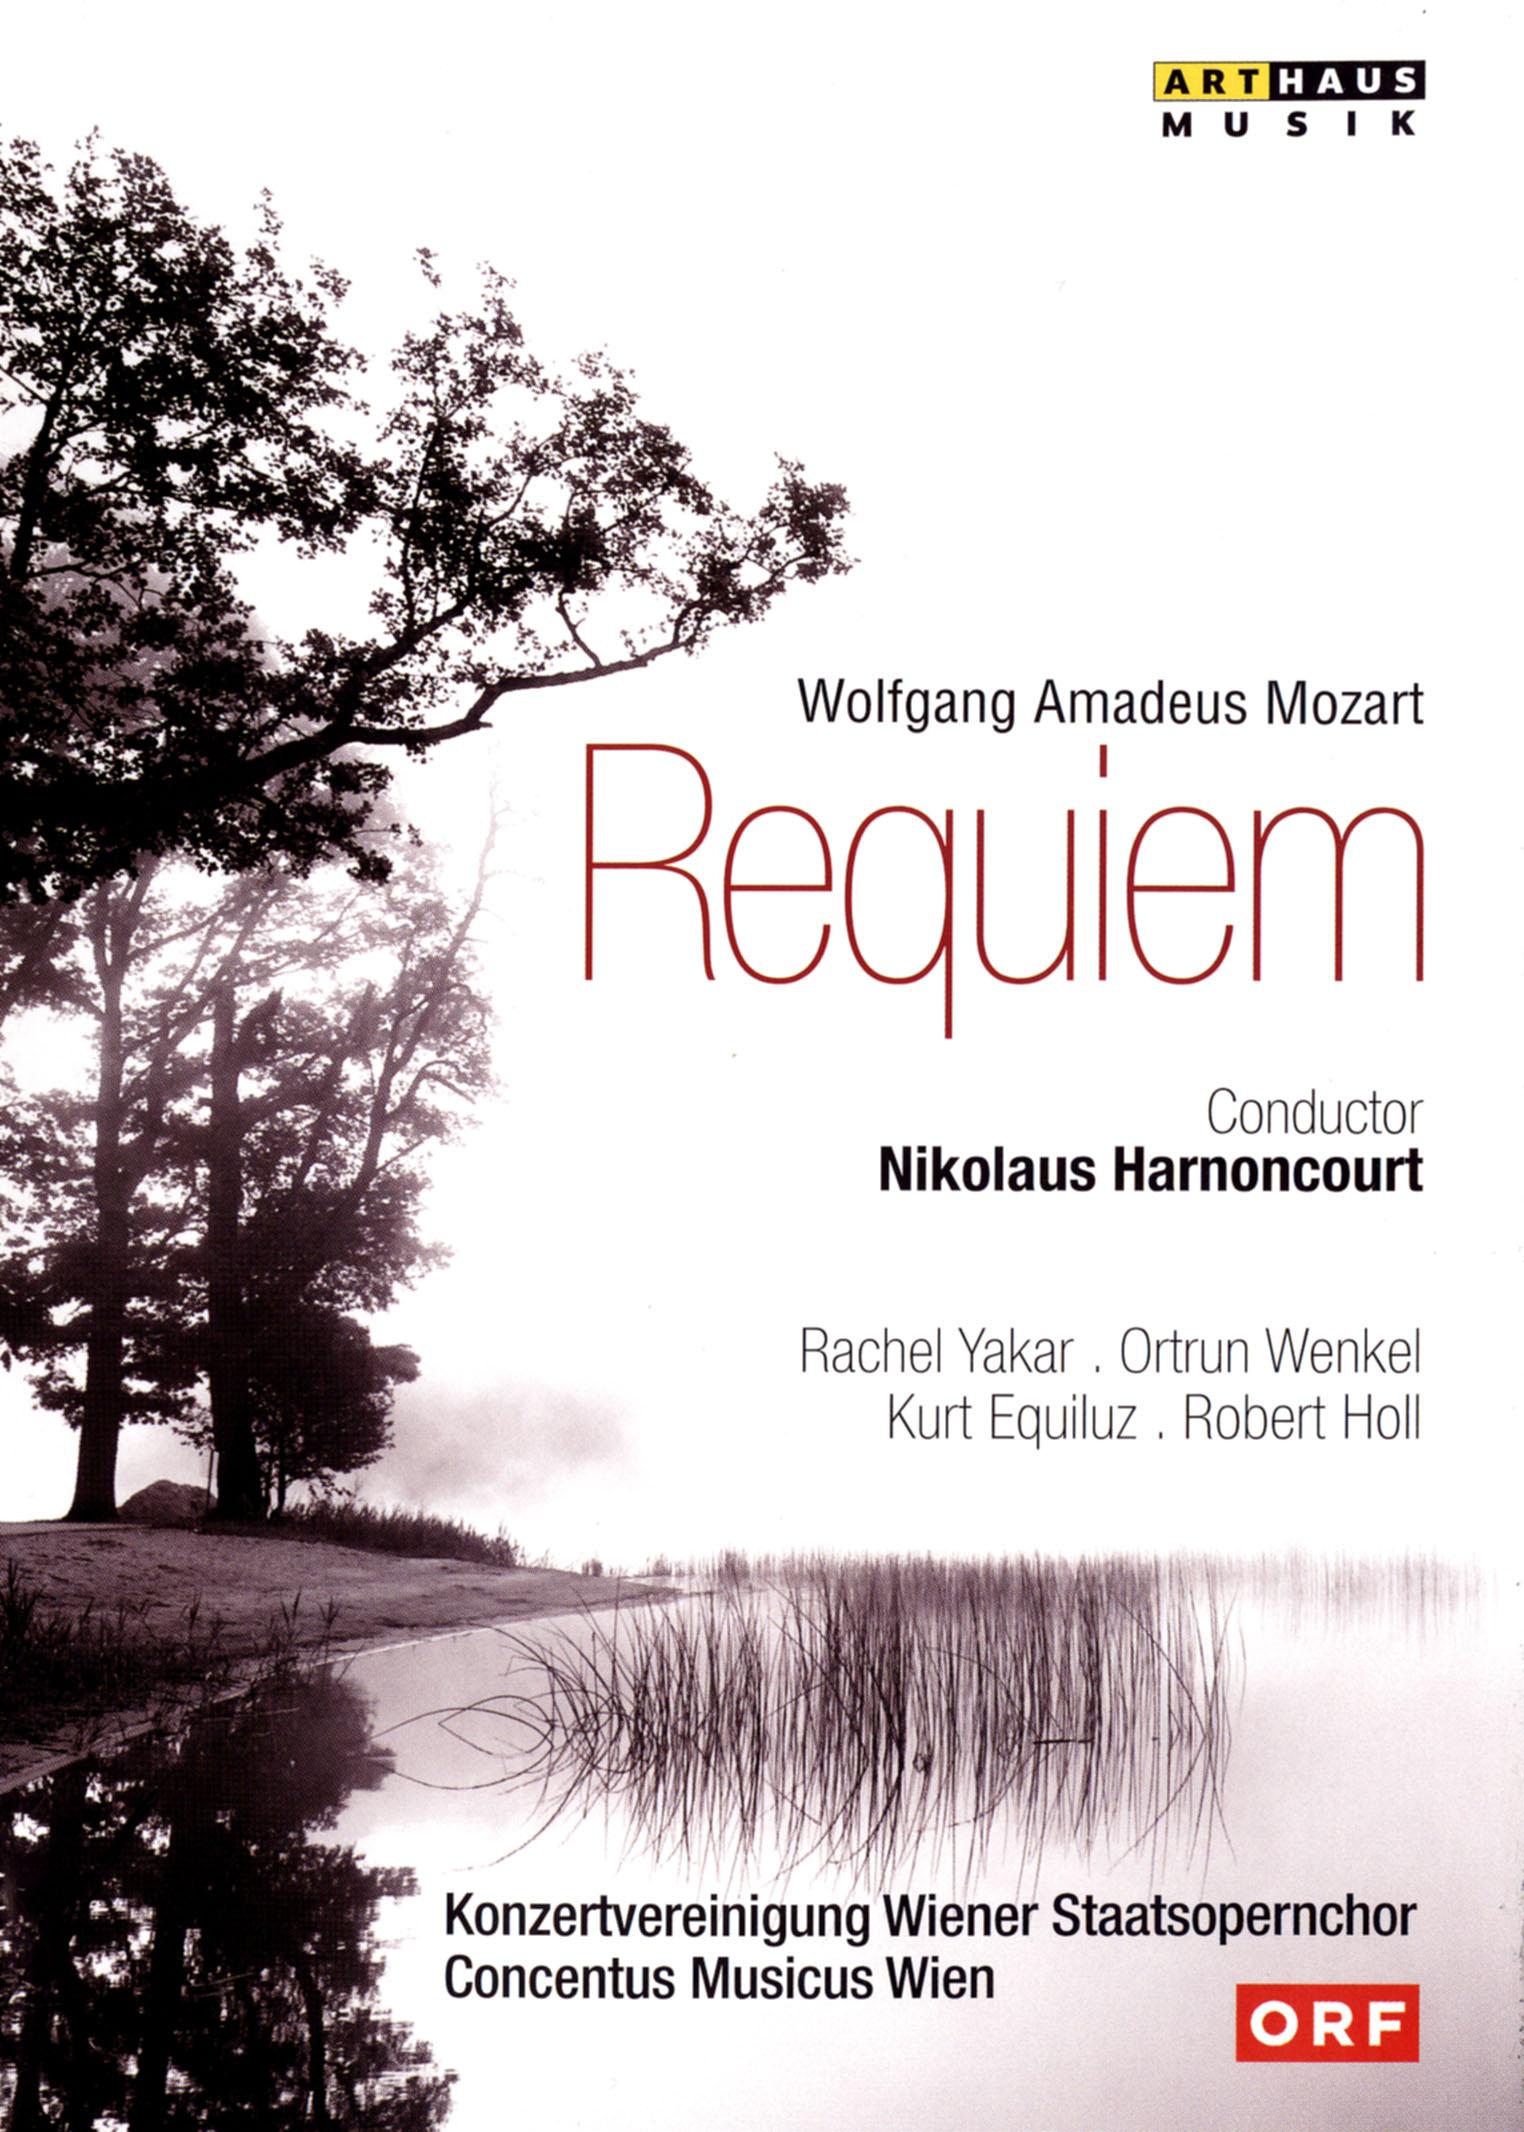 Nikolaus Harnoncourt/Concentus Musicus Wien: Mozart - Requiem